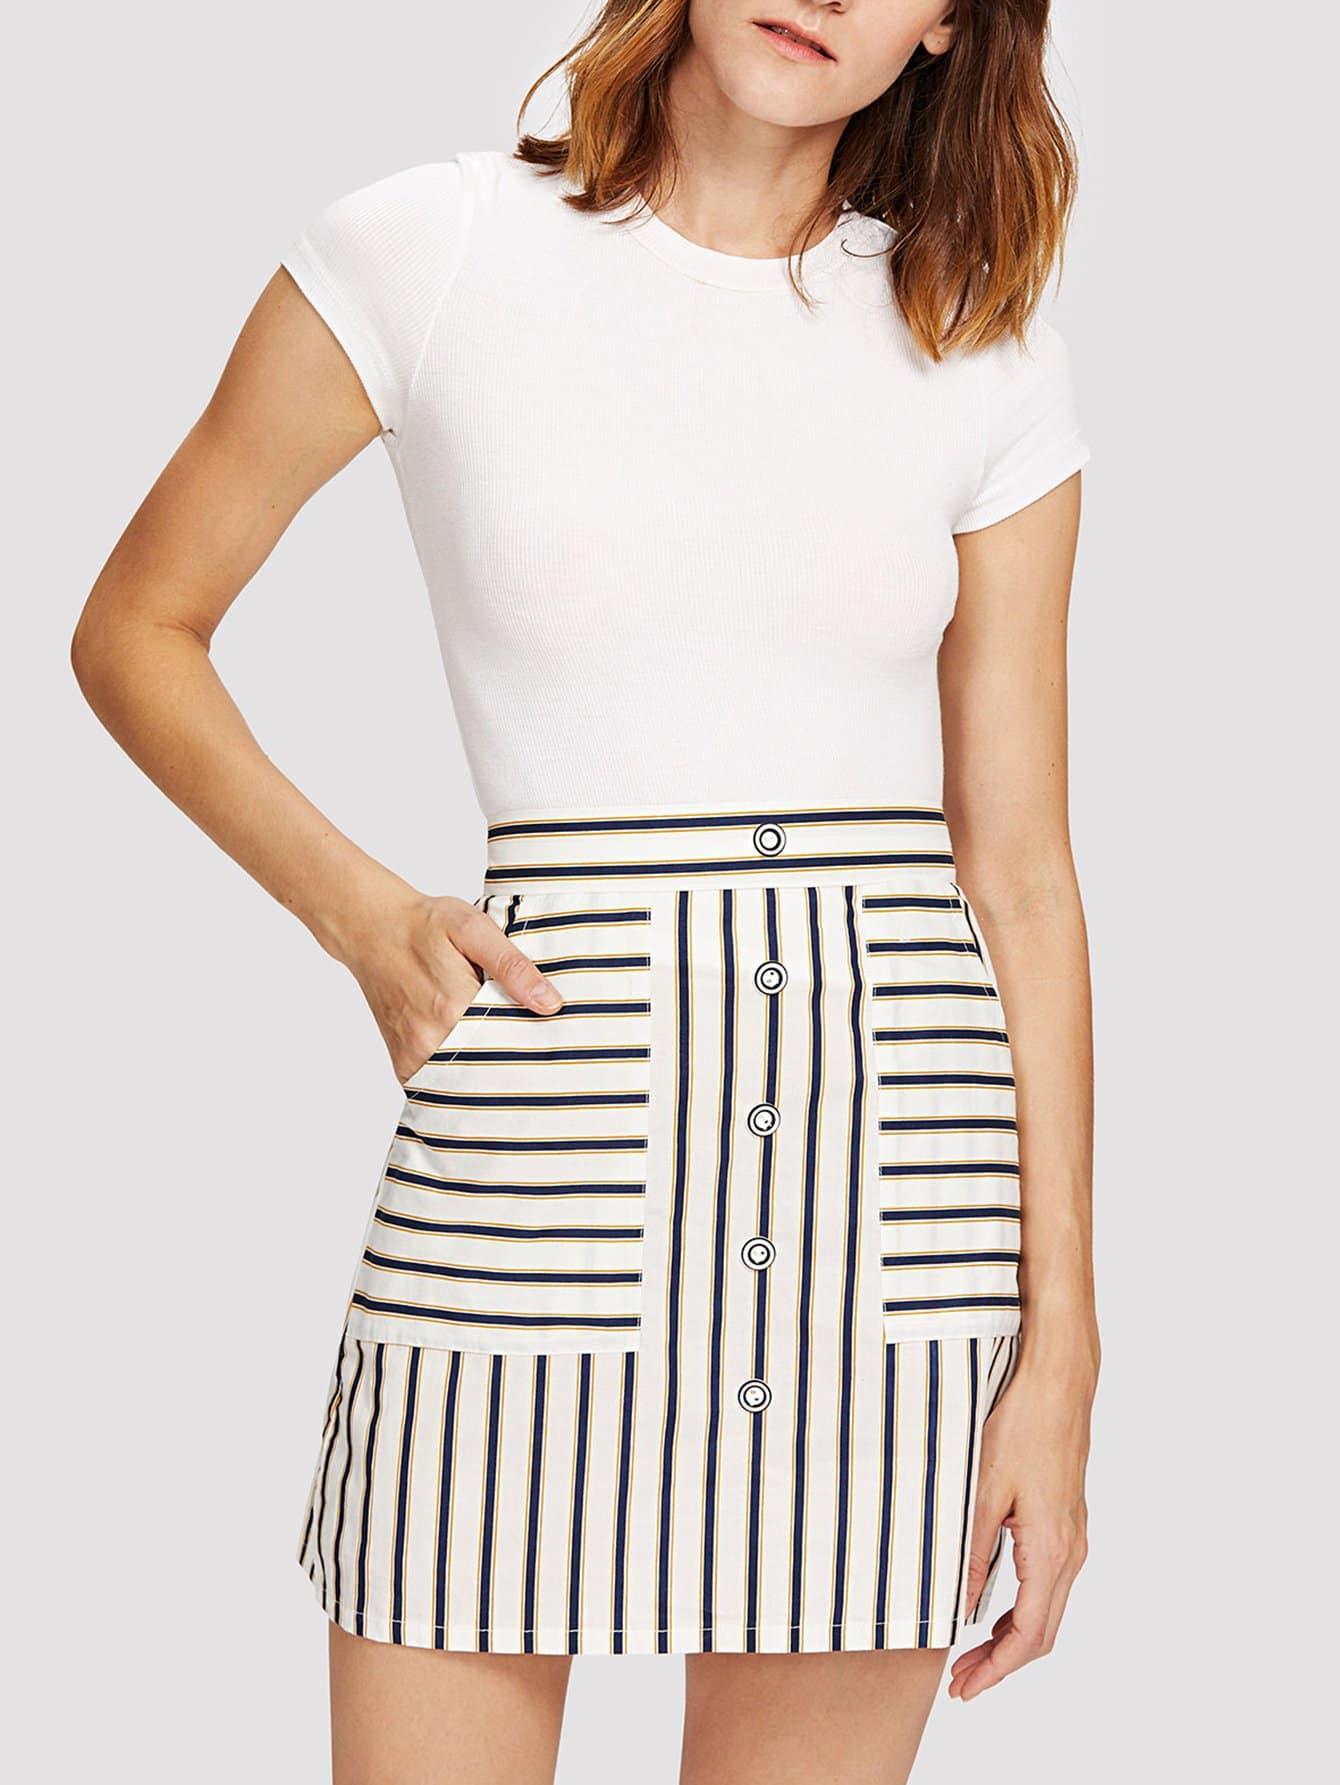 где купить Dual Pocket Striped Button Front Skirt дешево